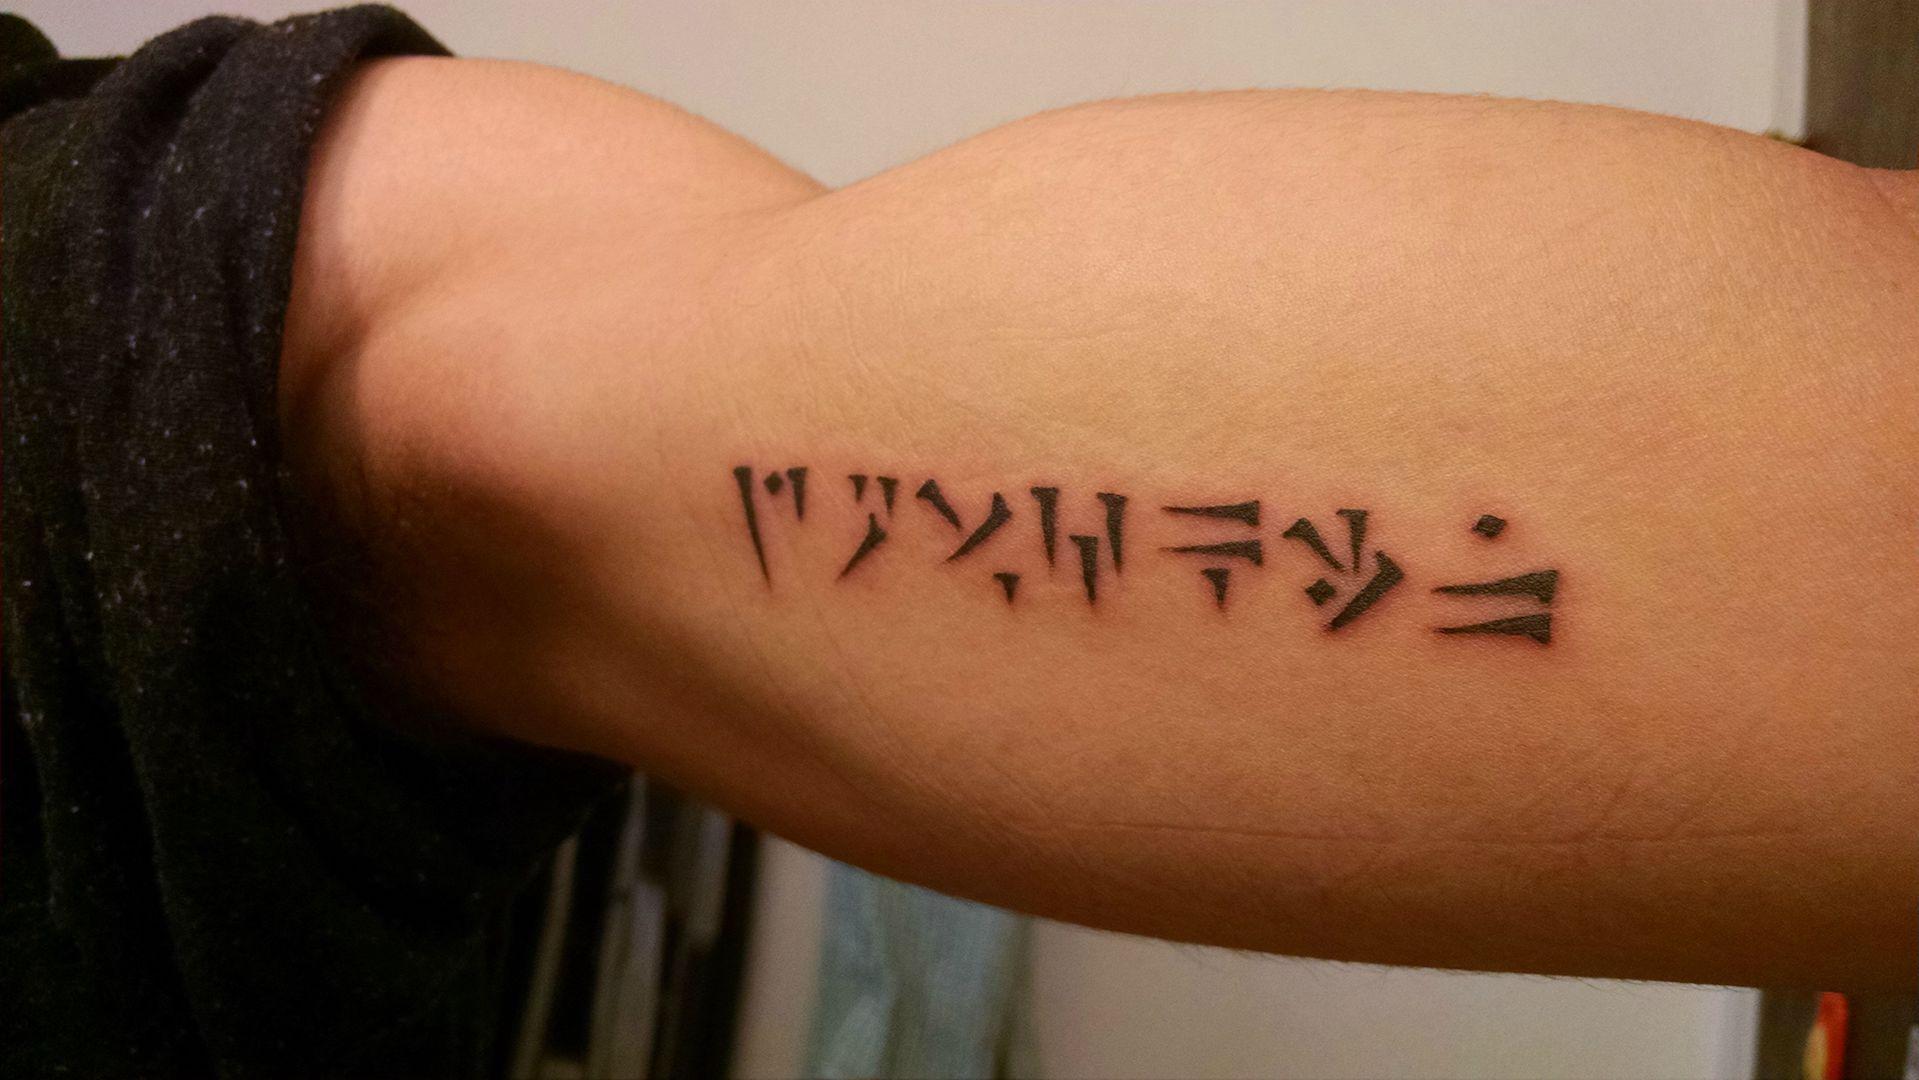 Fus ro dah tatoo